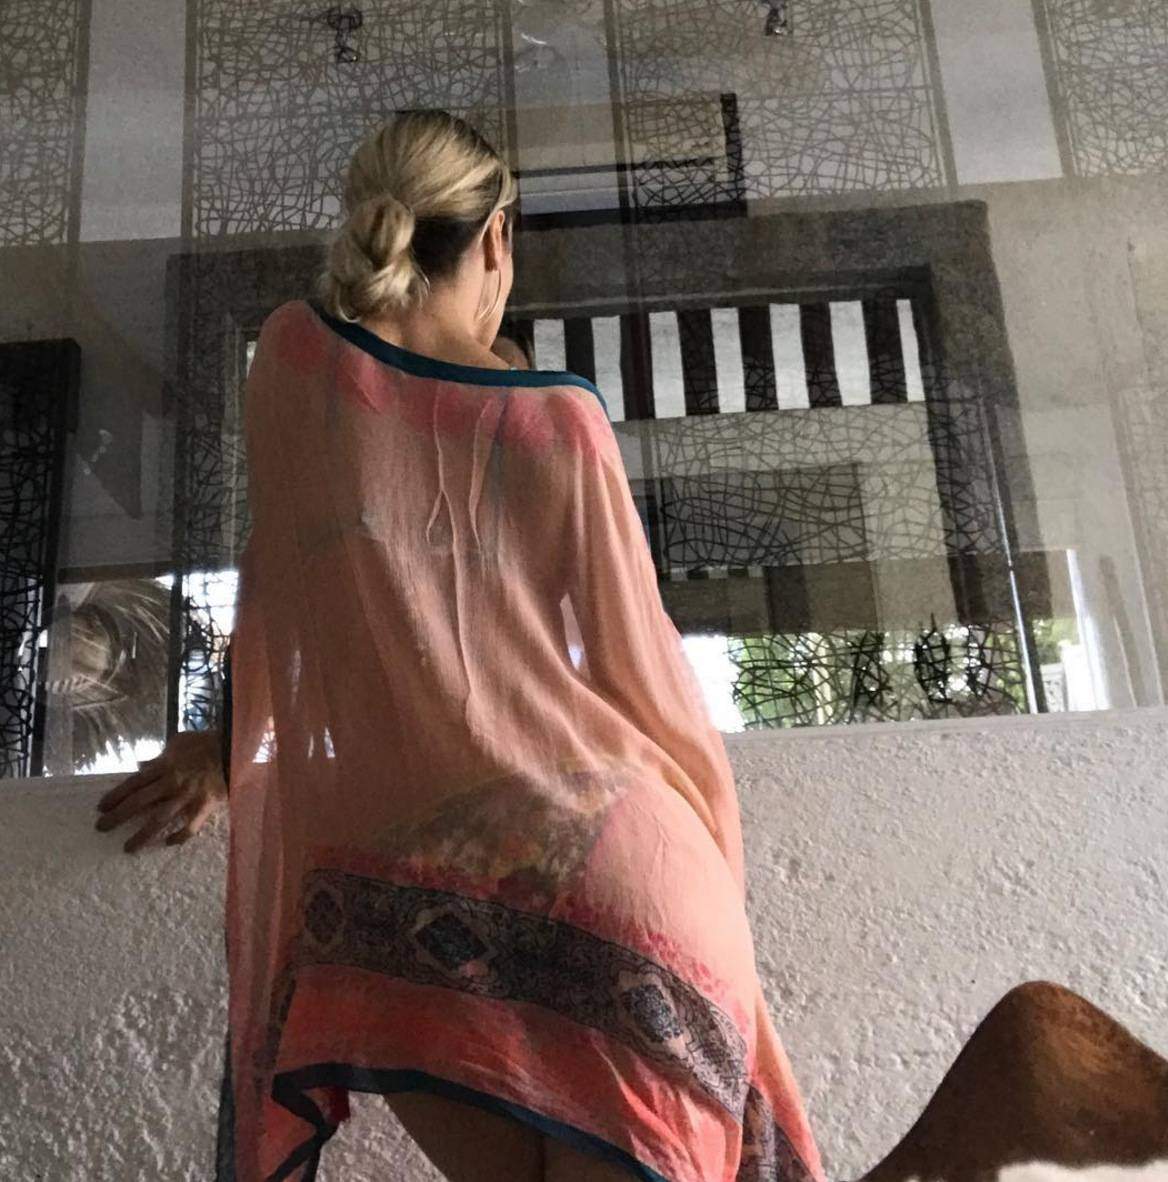 Cameltoe en sesion de yoga - 2 4